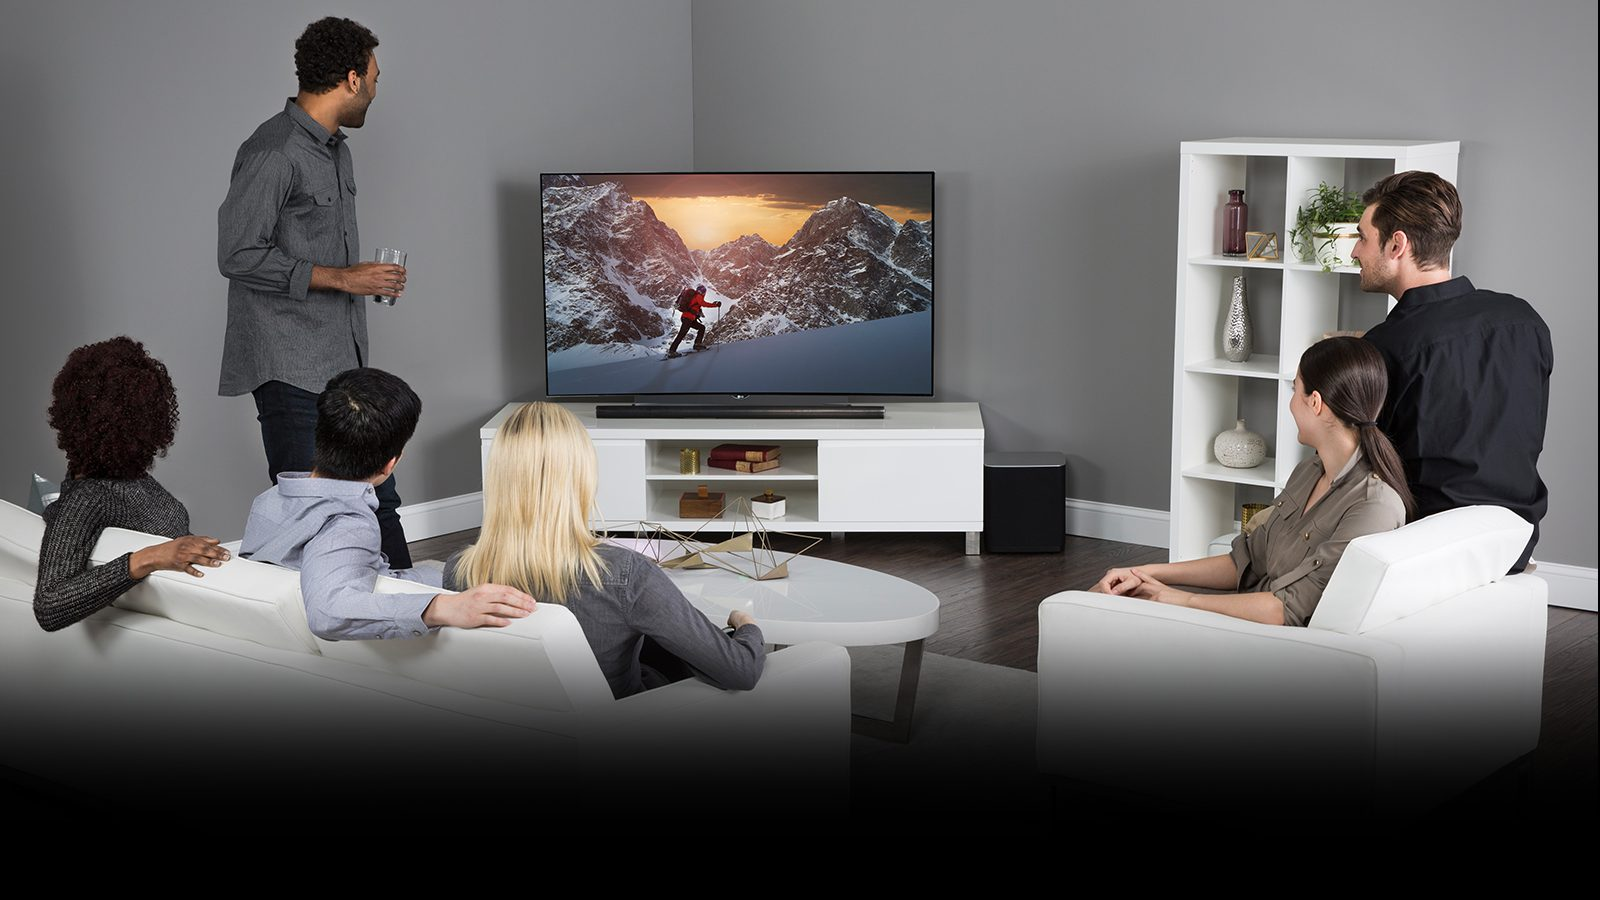 Best IPTV subscription service provider 2020